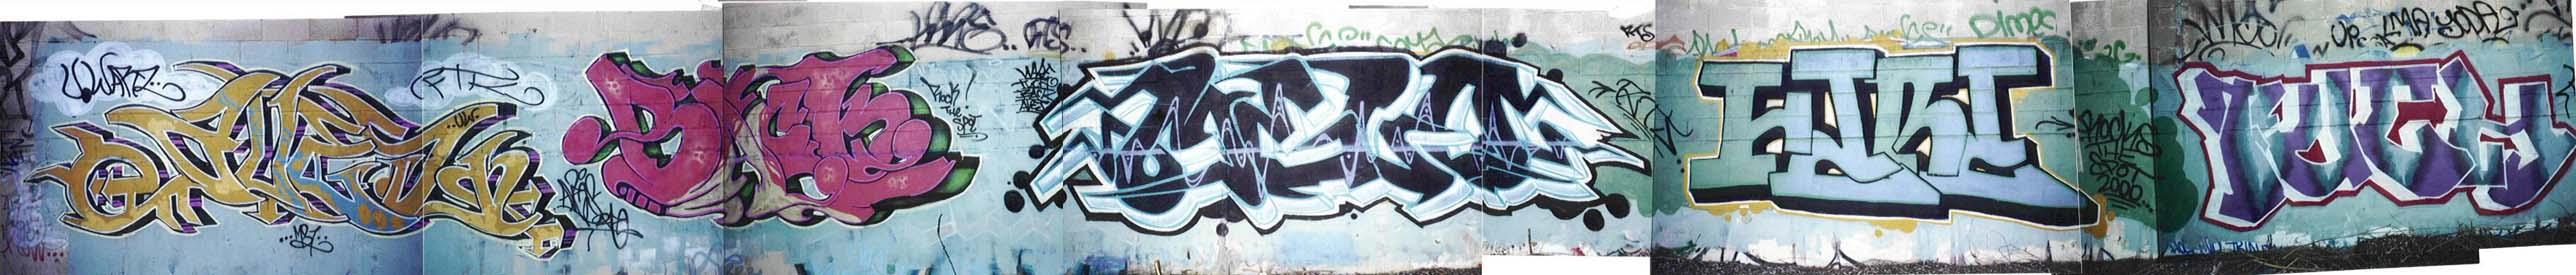 awww.graffiti.org_boston_boston_avesbackmelohare.jpg